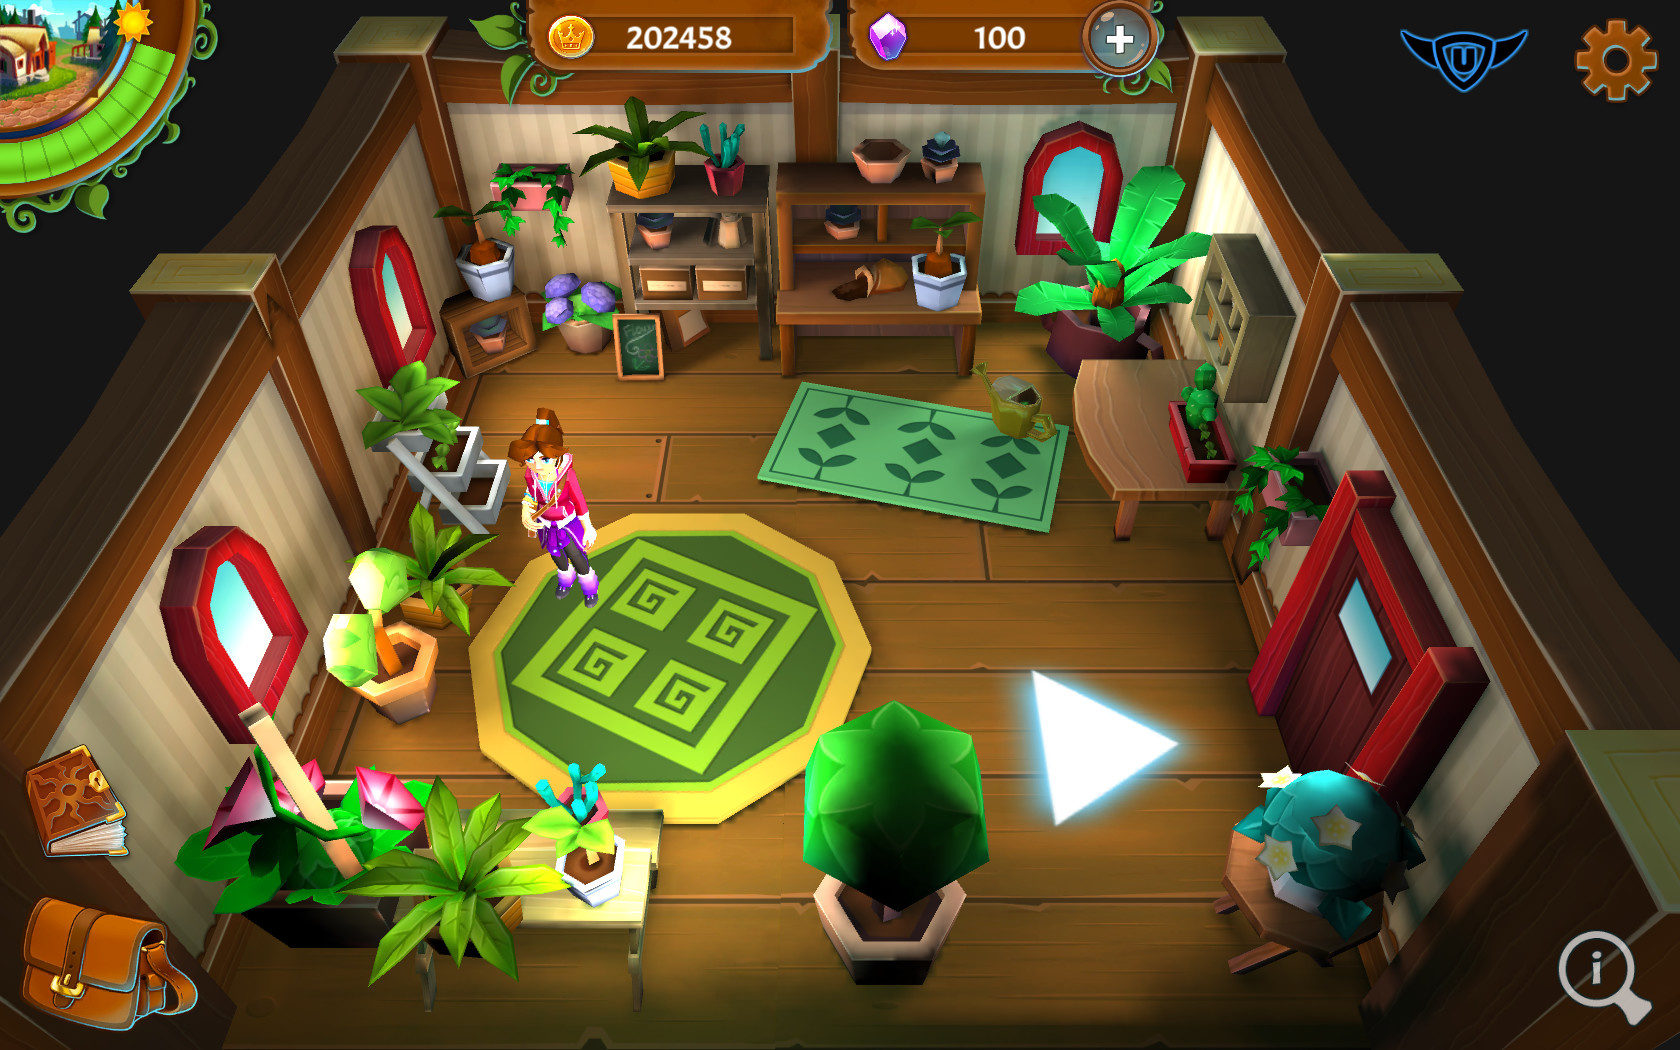 Ролевой симулятор Farmer's Fairy Tale выпустили в Steam